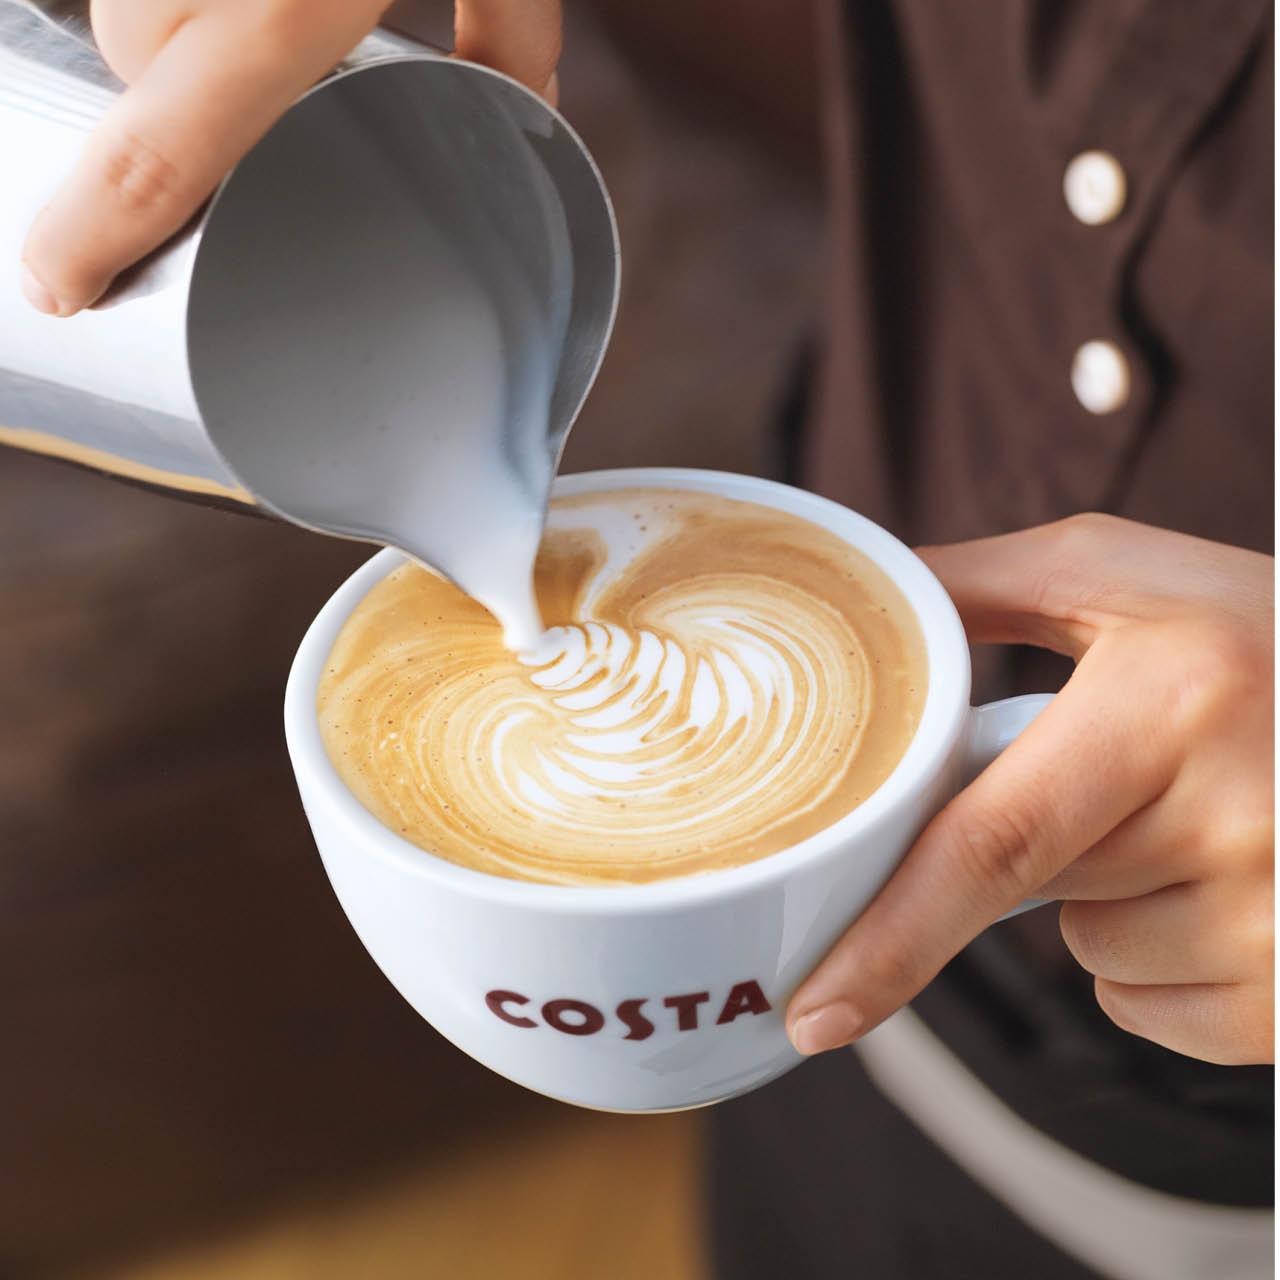 Staňte se odborníkem na techniku Latte Art